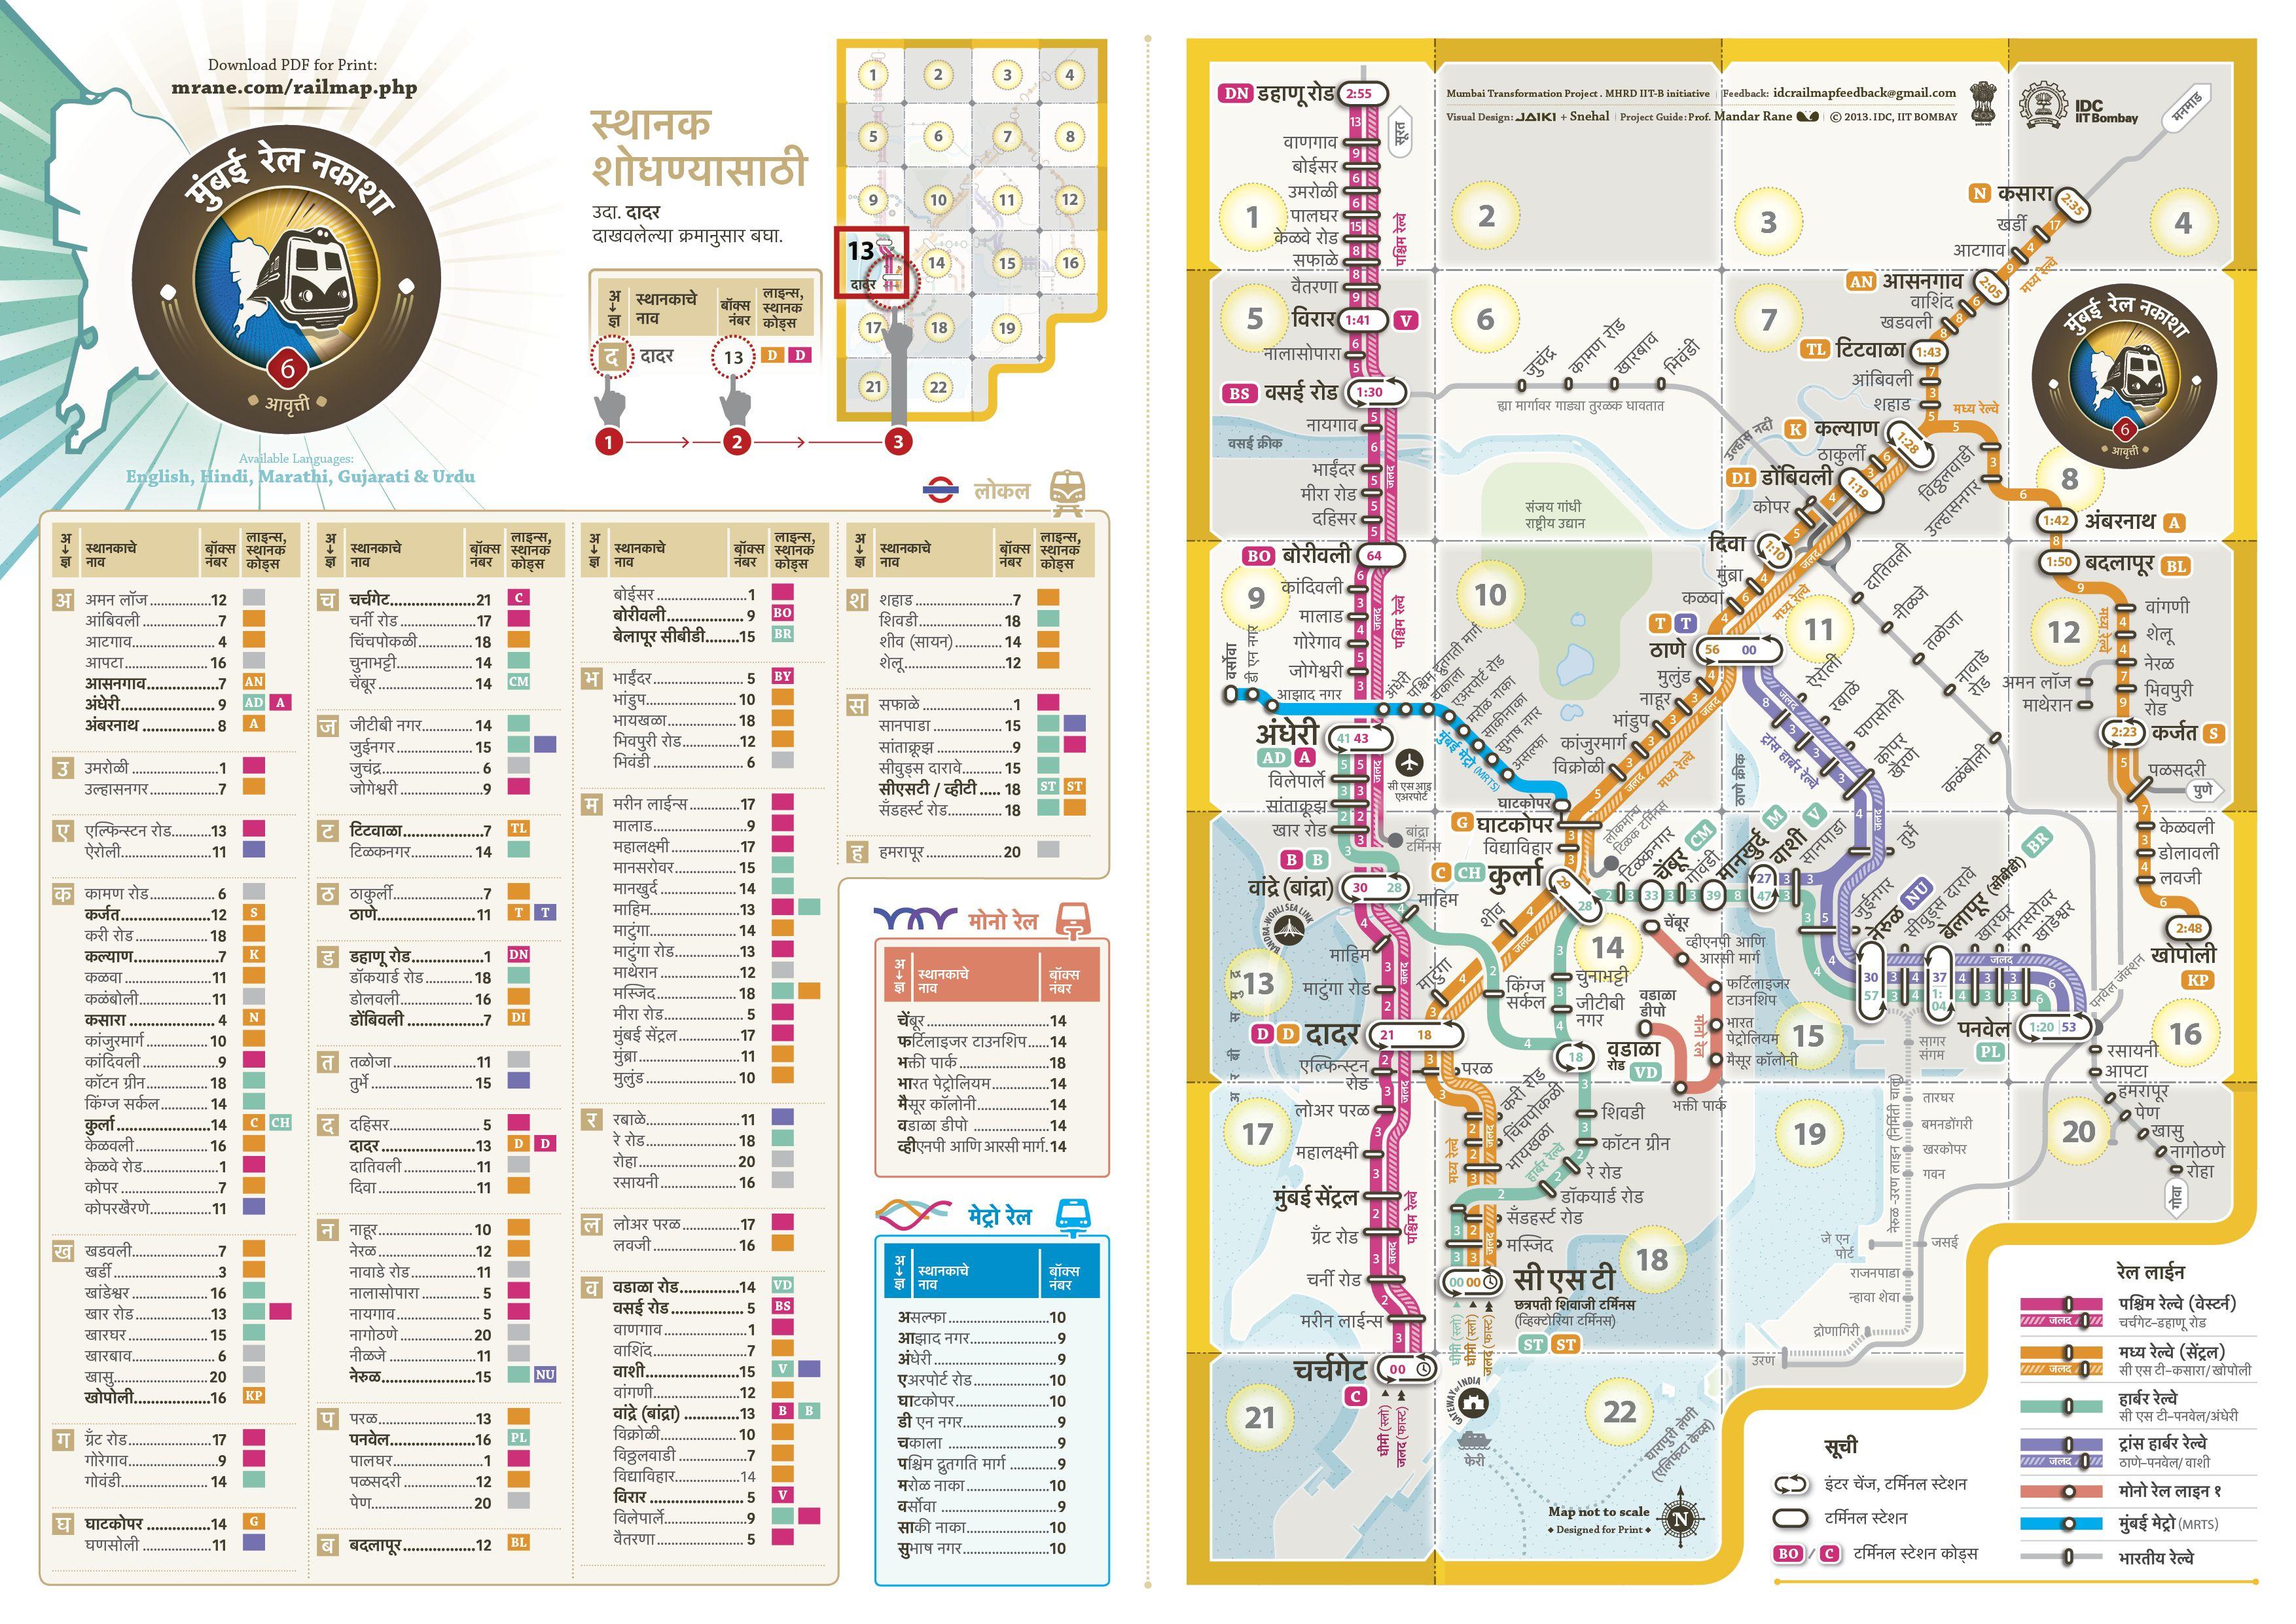 Mumbai Rail Map A Marathi Mumbai Local Pinterest Maps - Railway map usa 1890